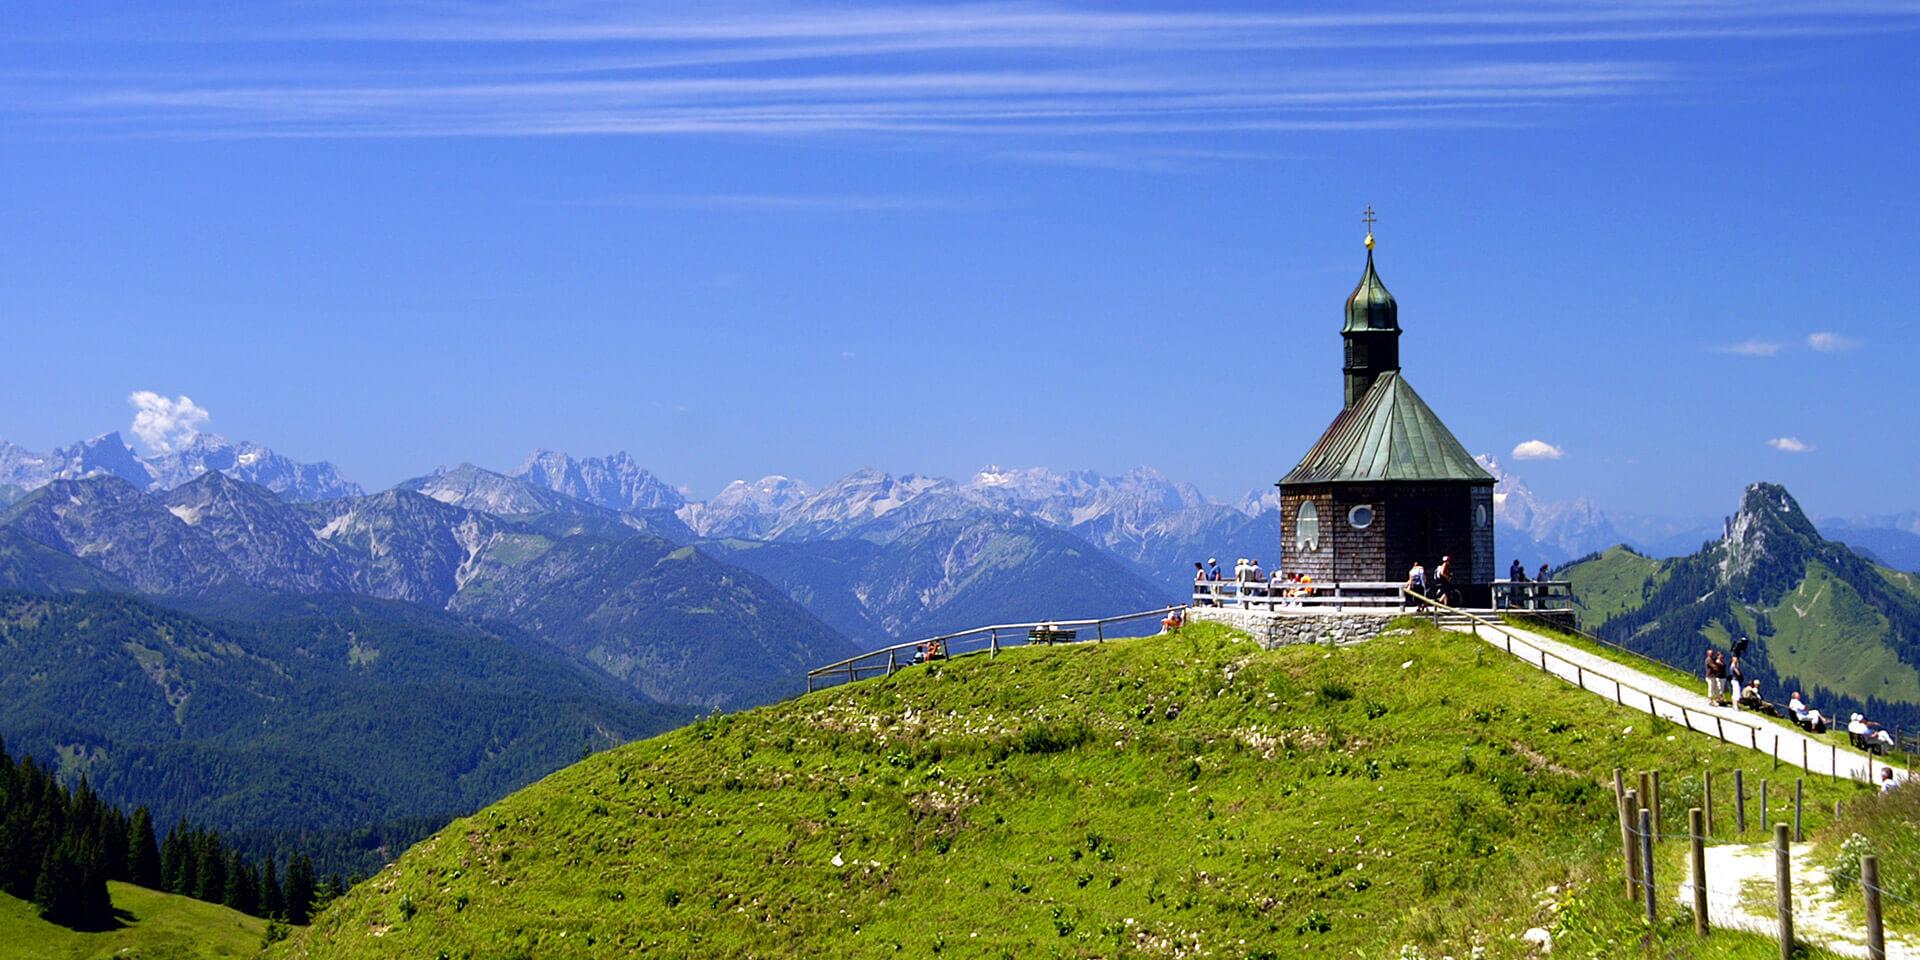 Kapelle in den Bergen